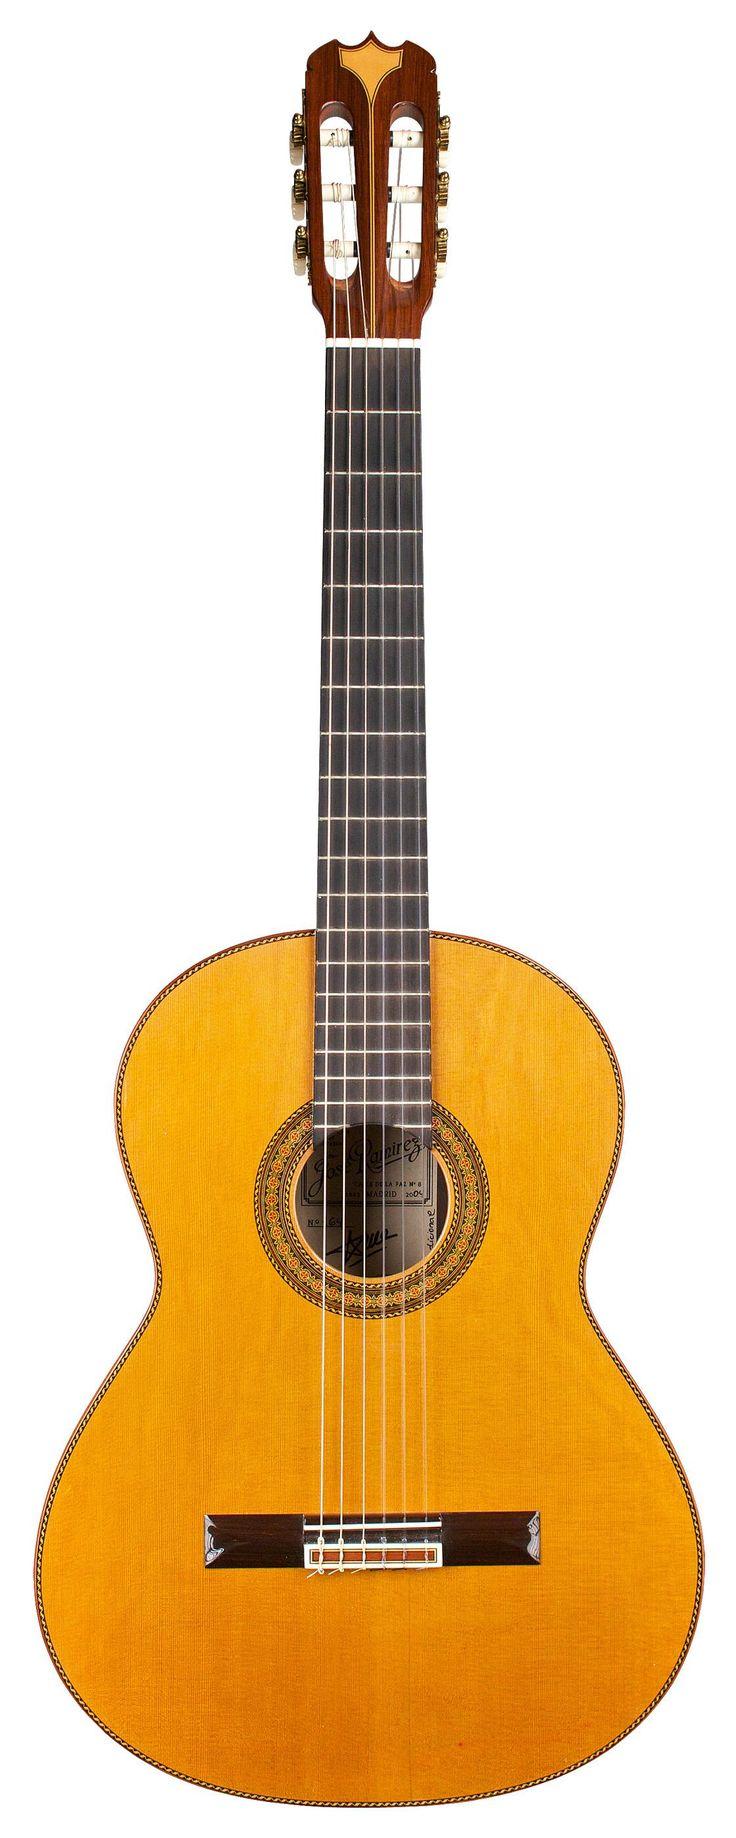 126 Best GuitarraRamirez Images On Pinterest